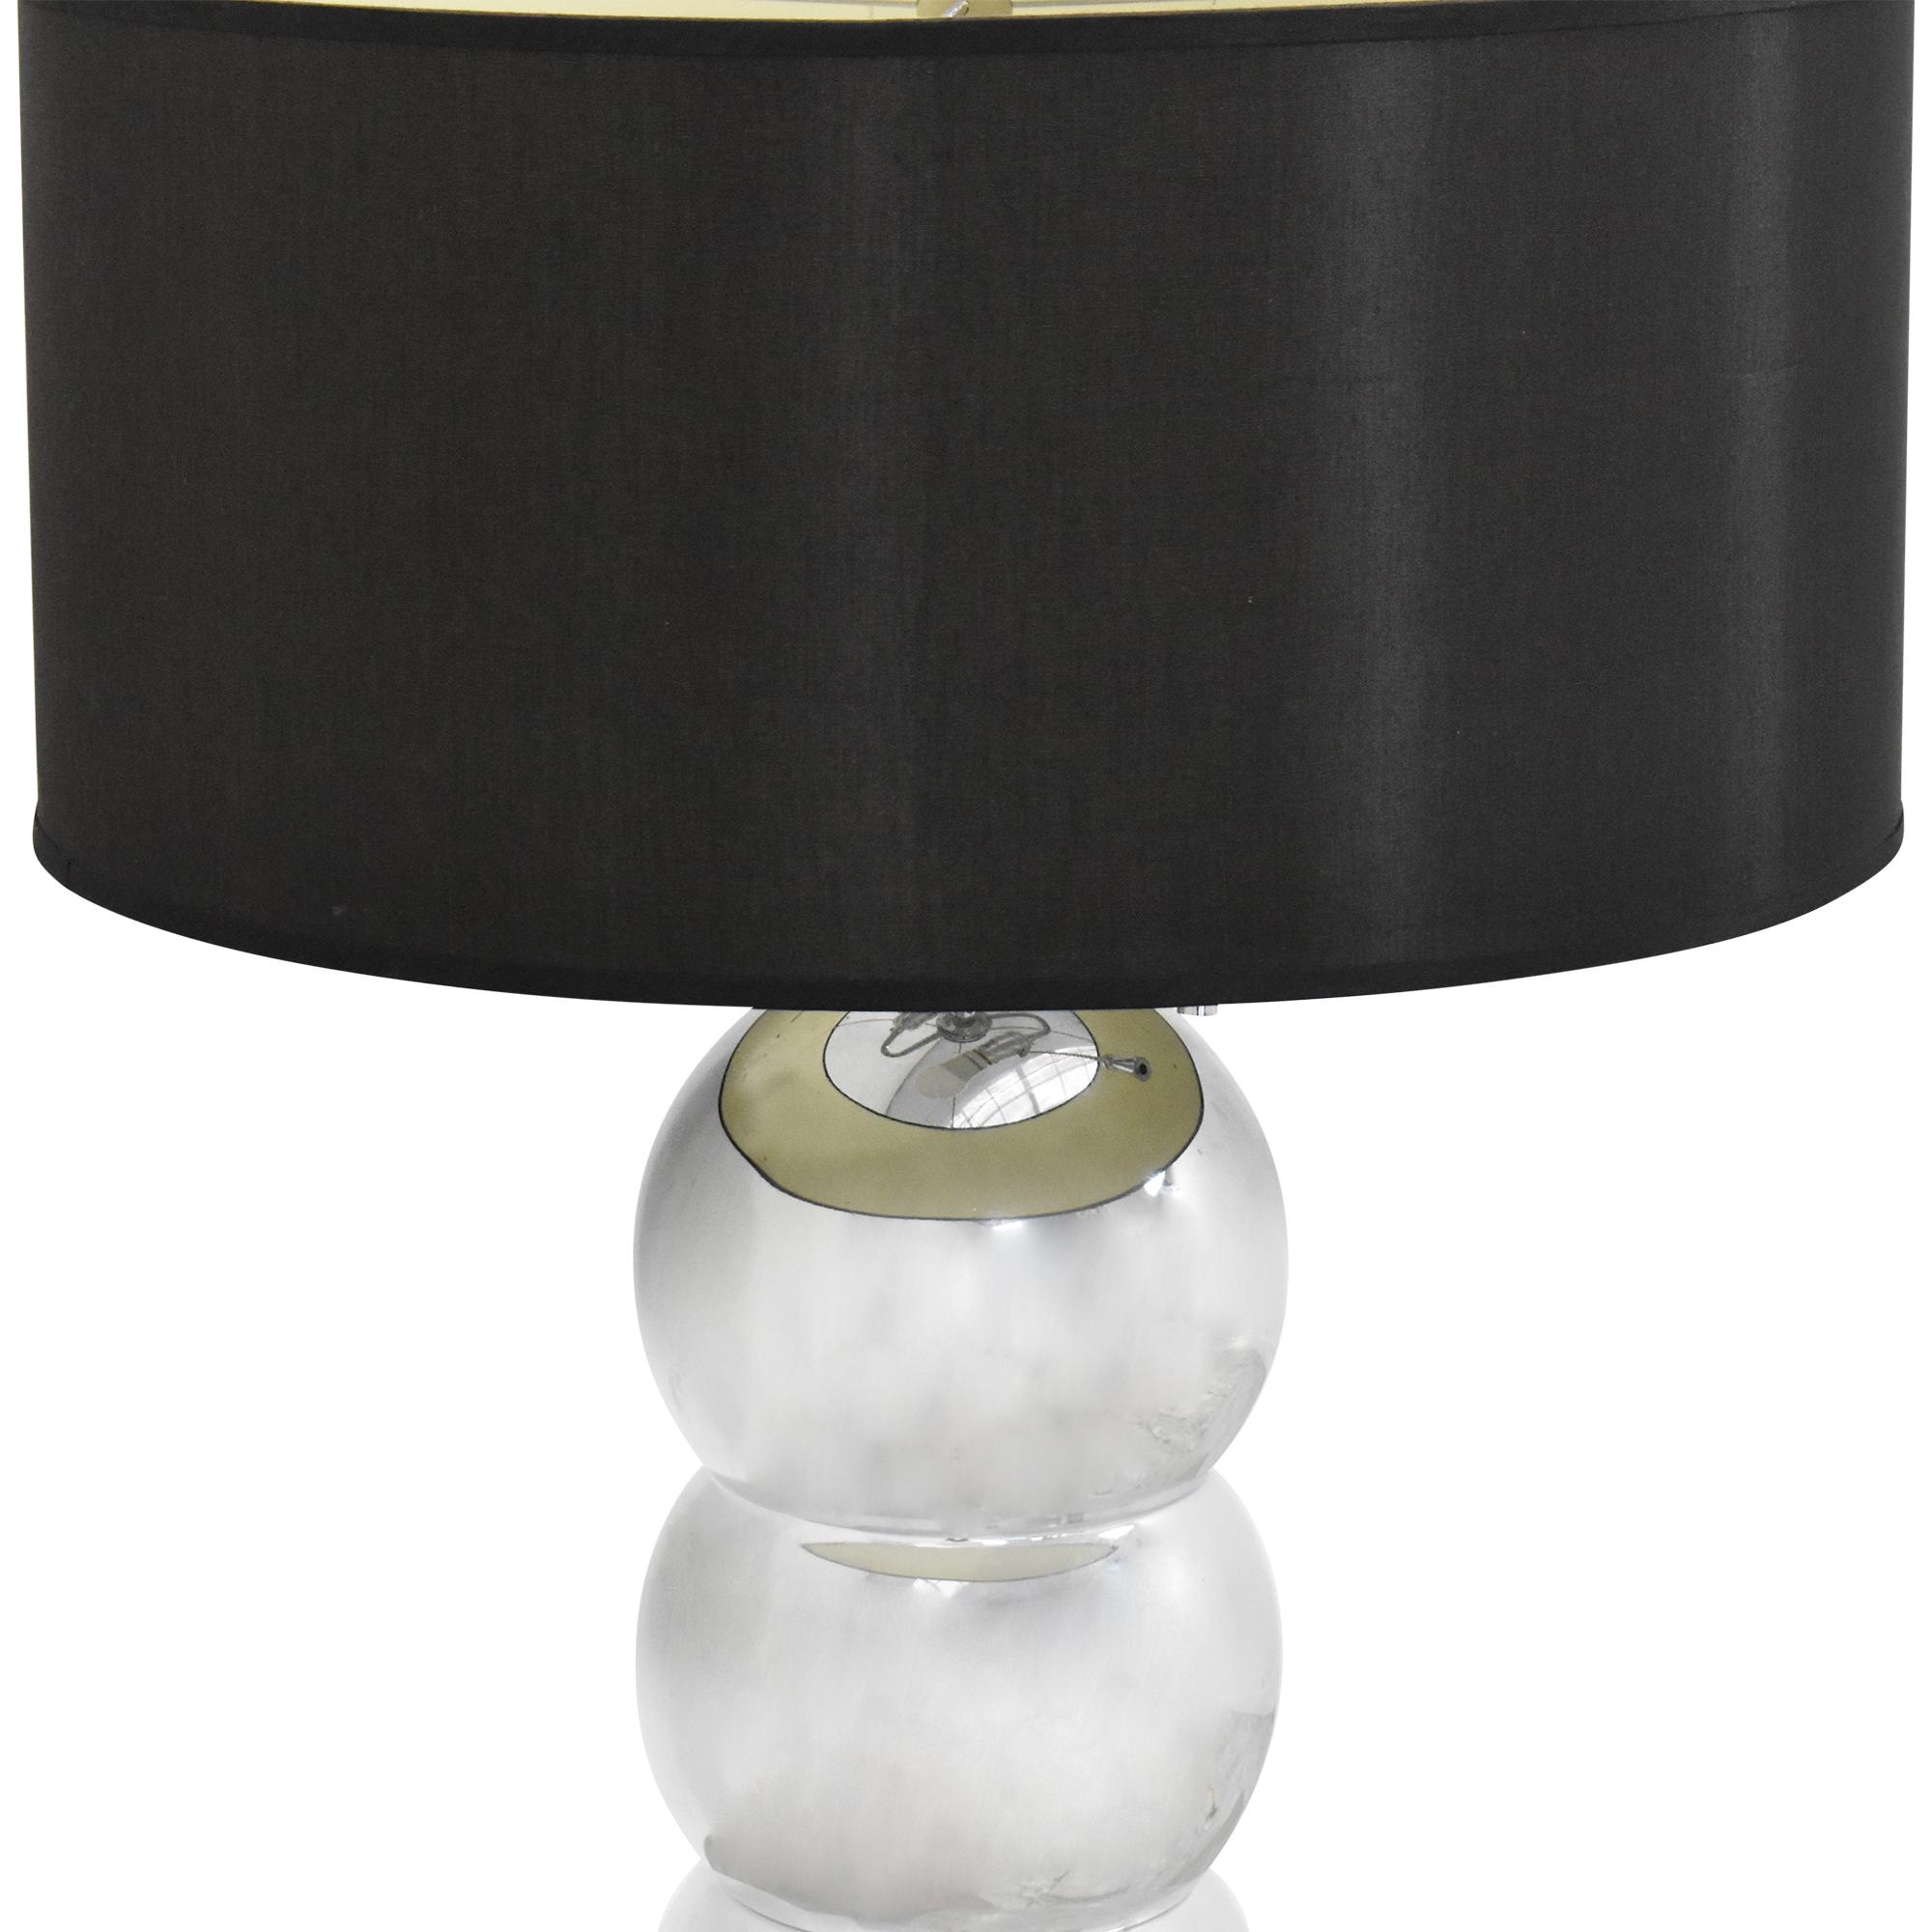 George Kovacs George Kovacs Stacked Ball Table Lamp ma